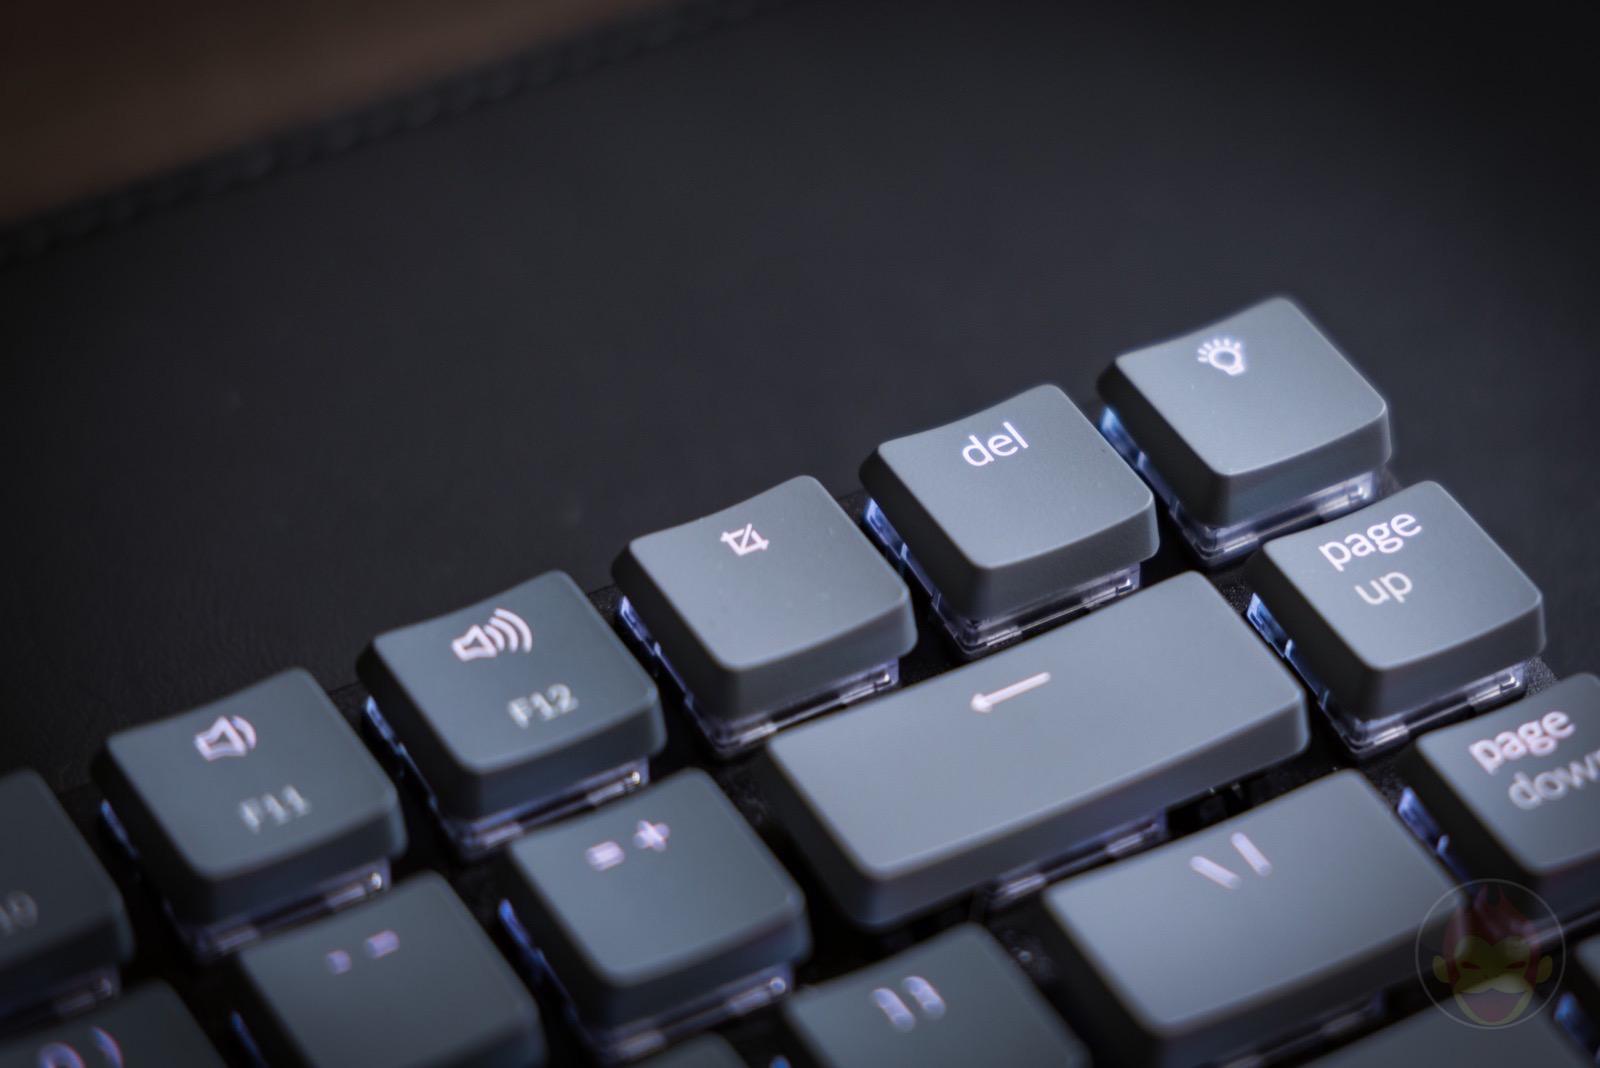 Delete-key-and-backspace-key-01.jpg